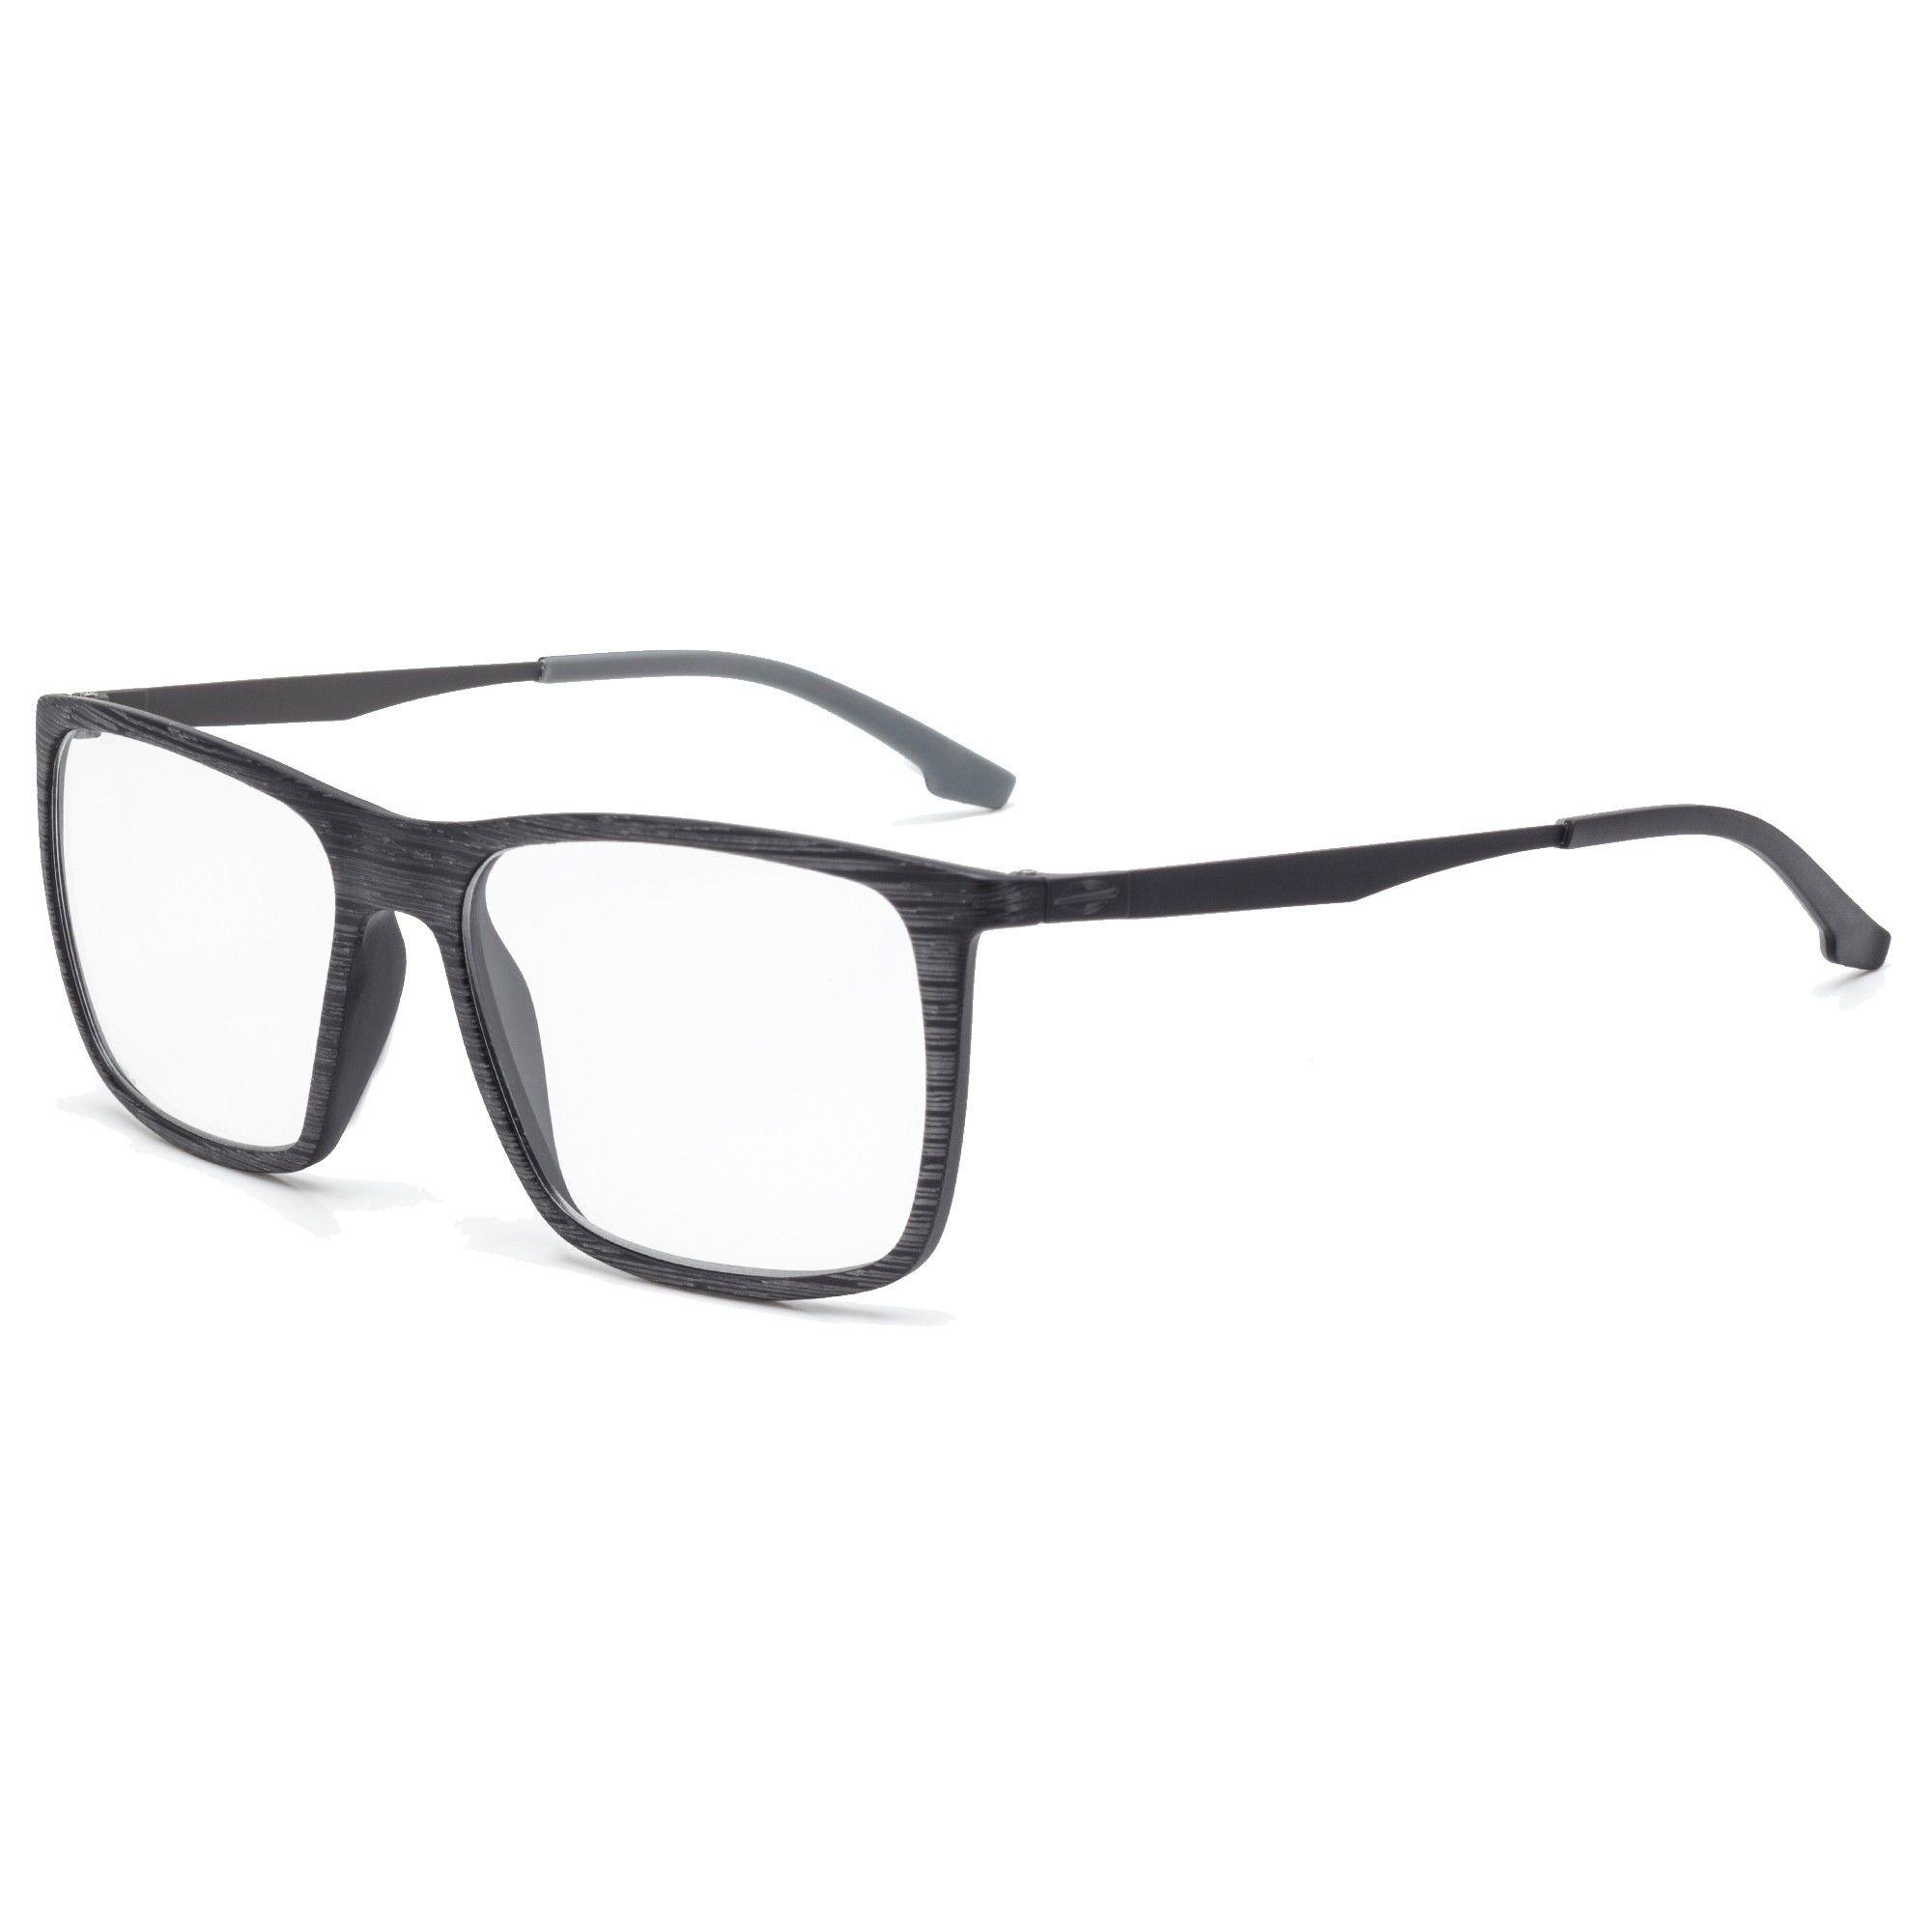 Óculos de Grau Masculino Mormaii Maha II M6055ADJ56